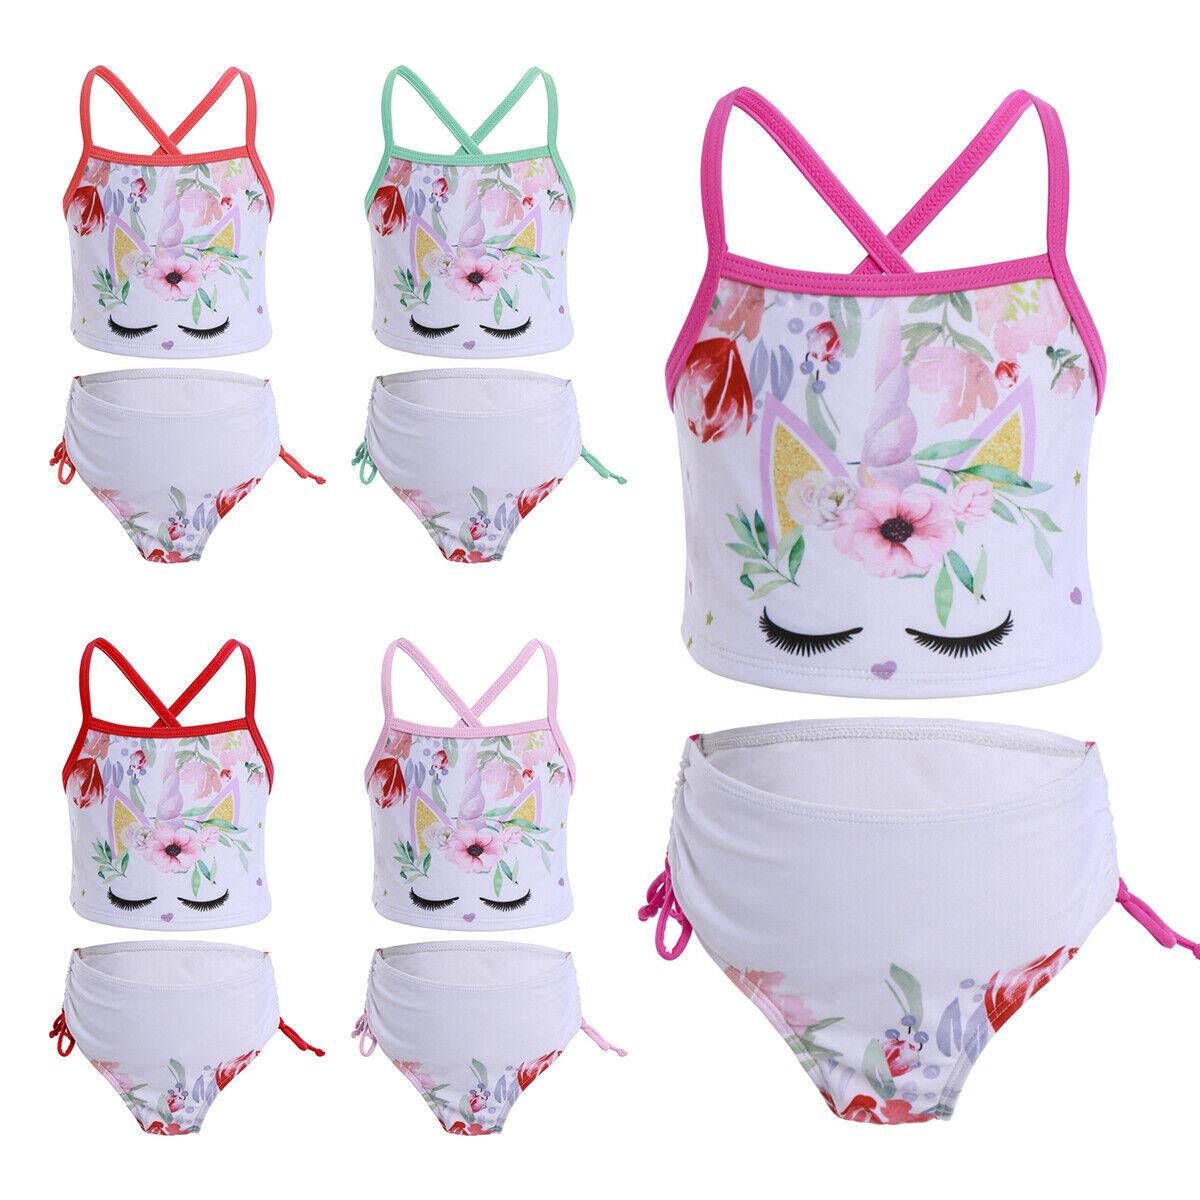 Newborn Baby Girl Swimsuit Unicorn Floral Lace Cartoon Swimwear Bathing Suit Set